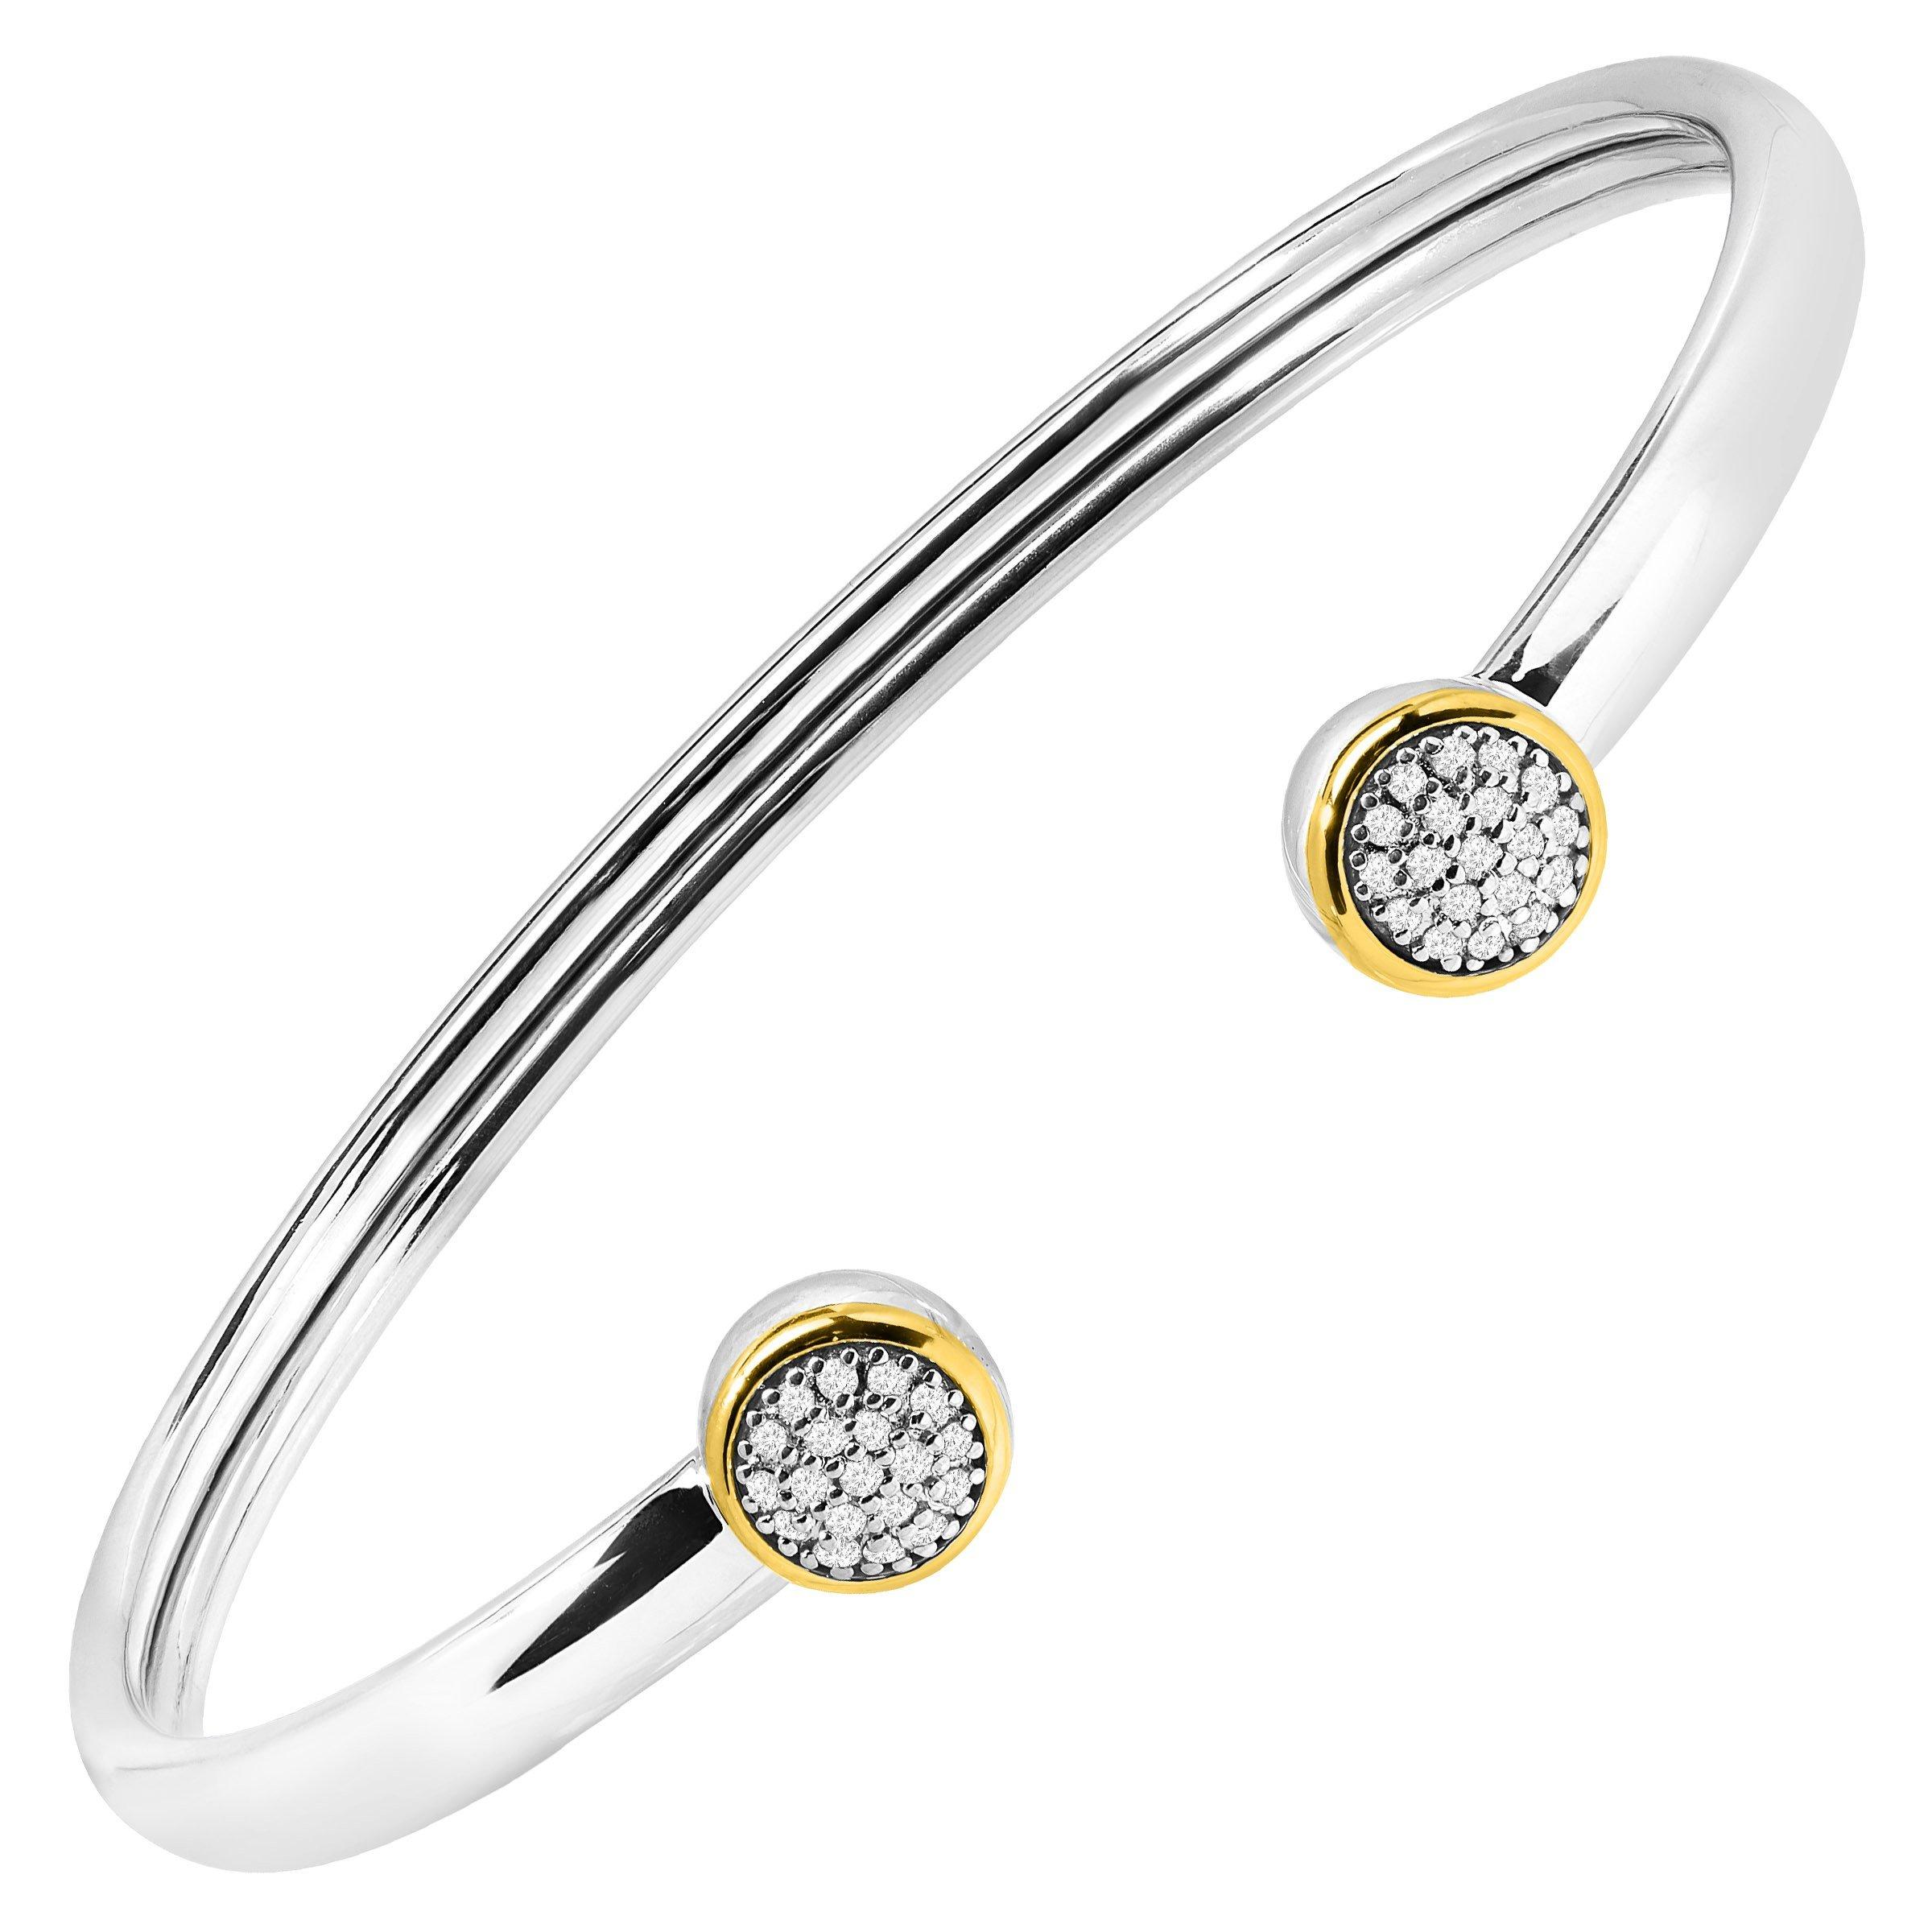 1 ct Diamond Circle Cuff Bracelet in Sterling Silver & 14K Gold